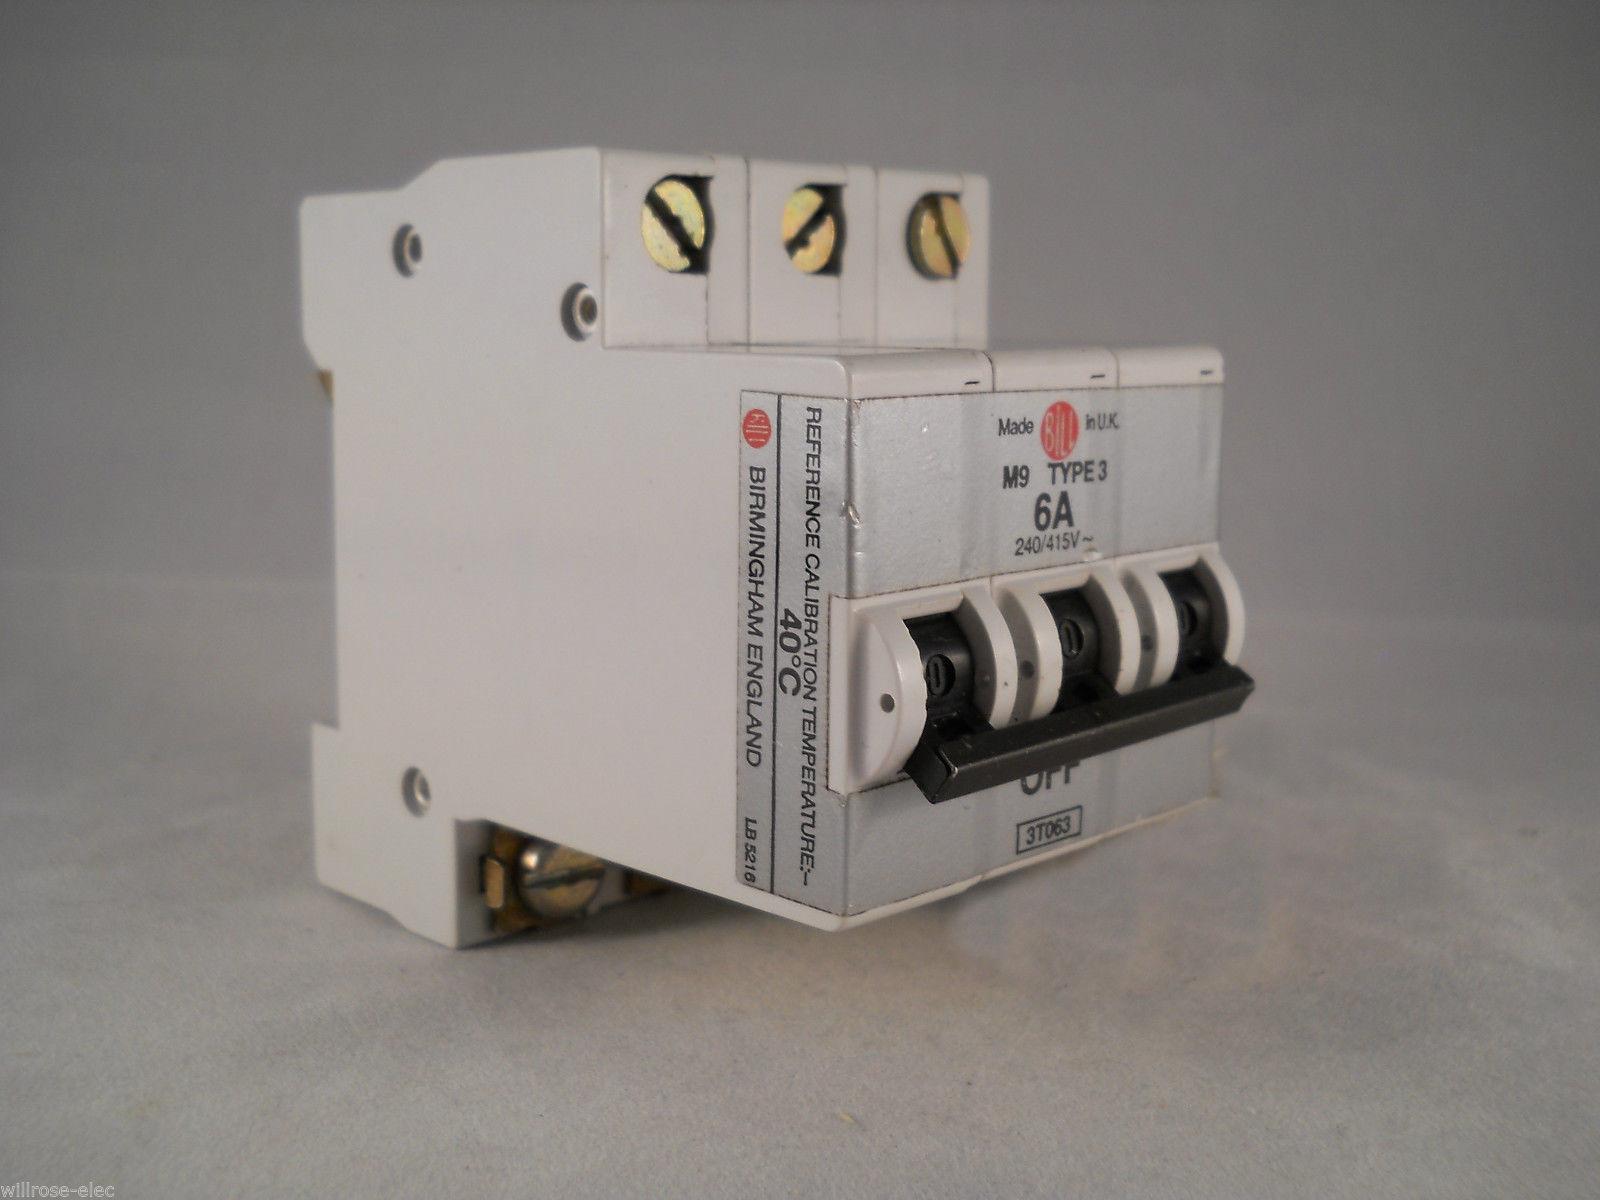 Bill MCB 6 Amp Type 3 M9 Triple Pole 3 Phase 6A Talisman MEM 63MB3 ...